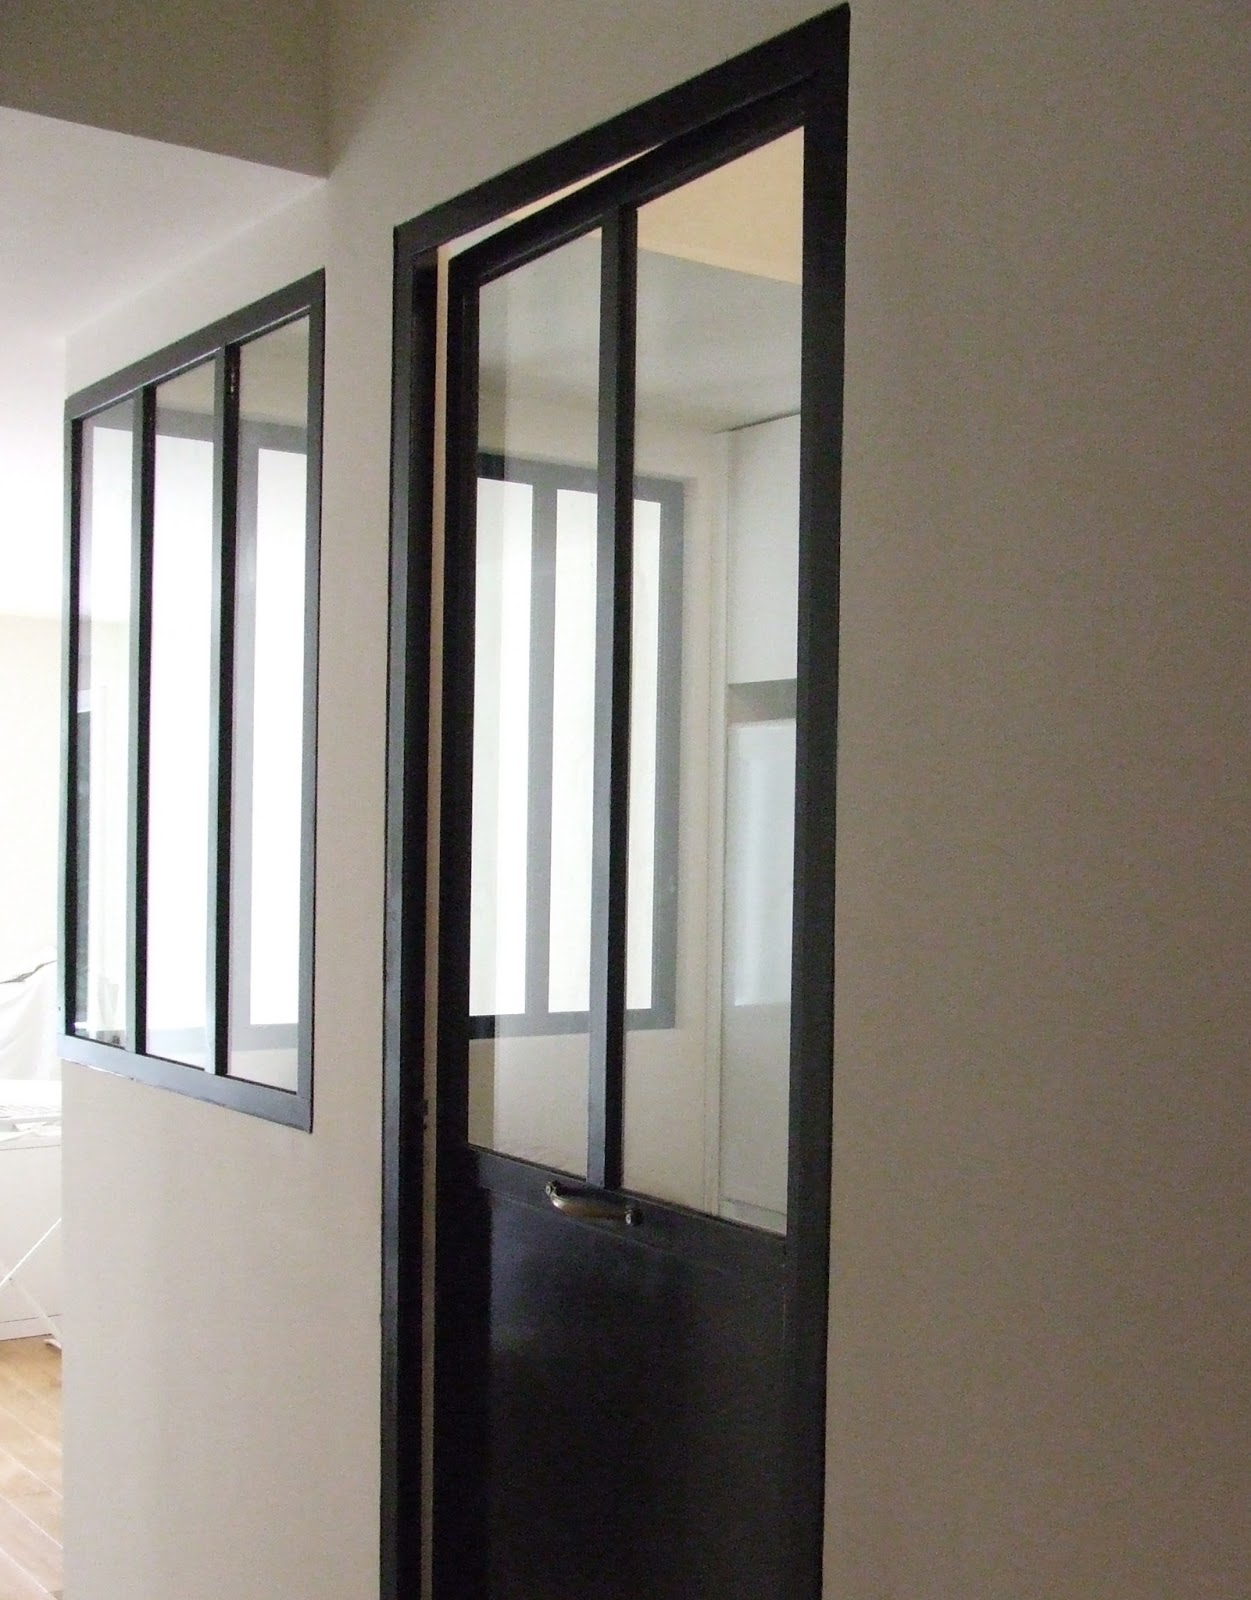 castorama verriere interieure maison design. Black Bedroom Furniture Sets. Home Design Ideas